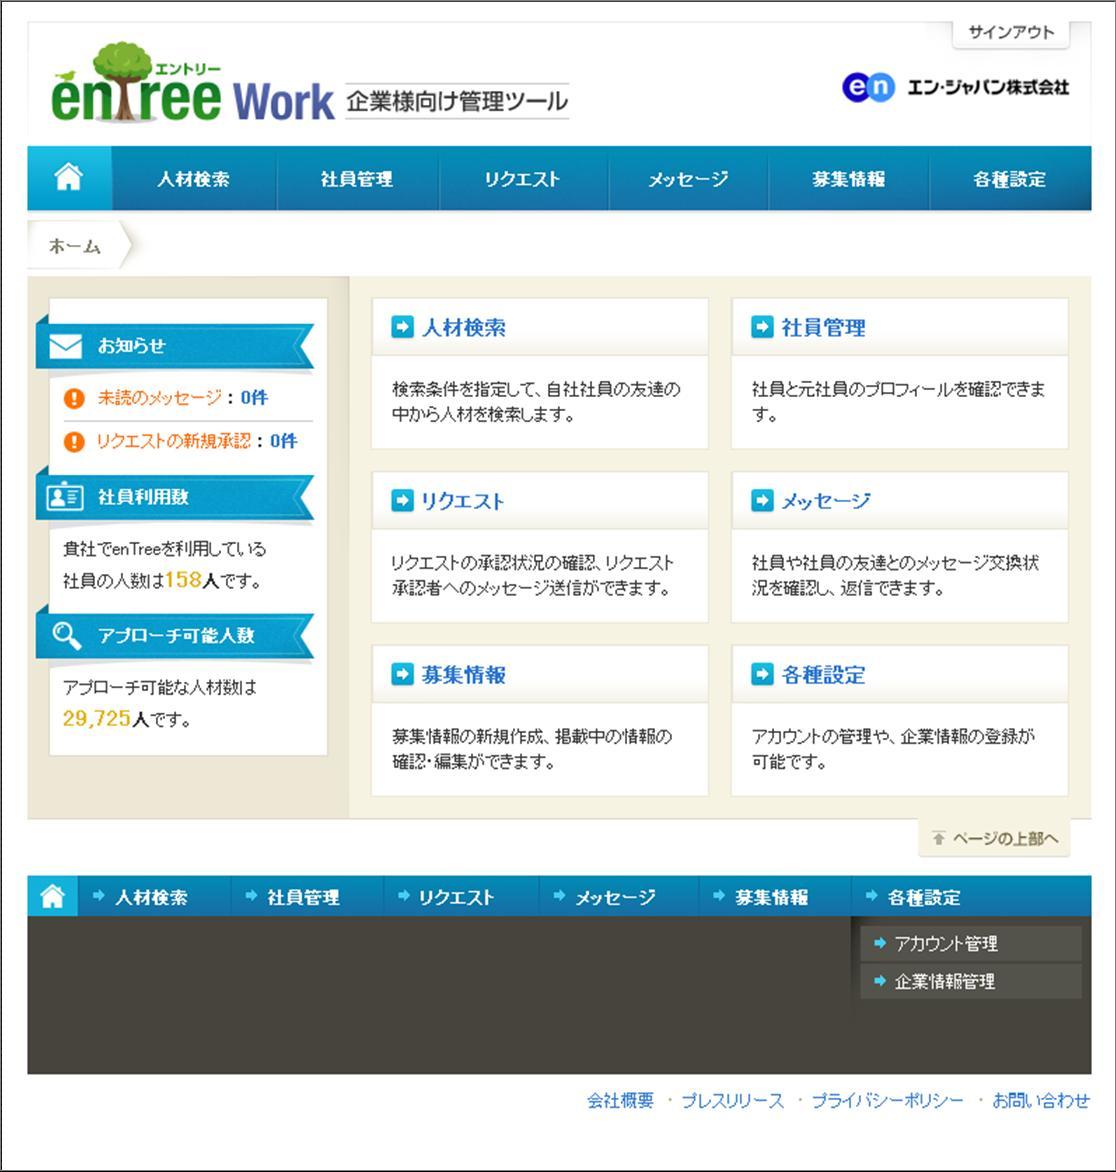 enTree_Work_entry